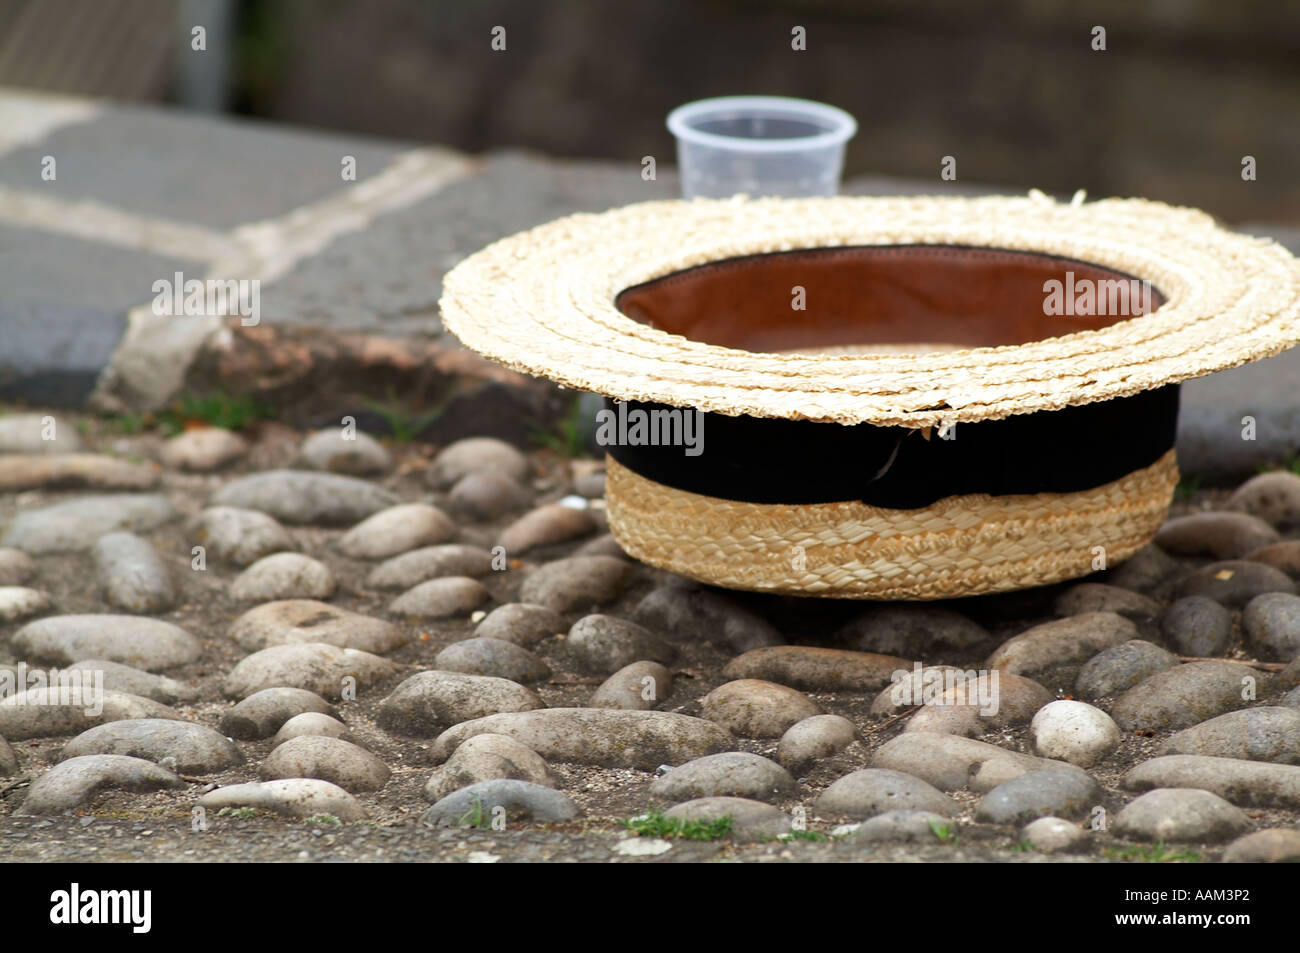 straw, boater, hat, posh, salad, days, posh, smart, henley, regatta, - Stock Image